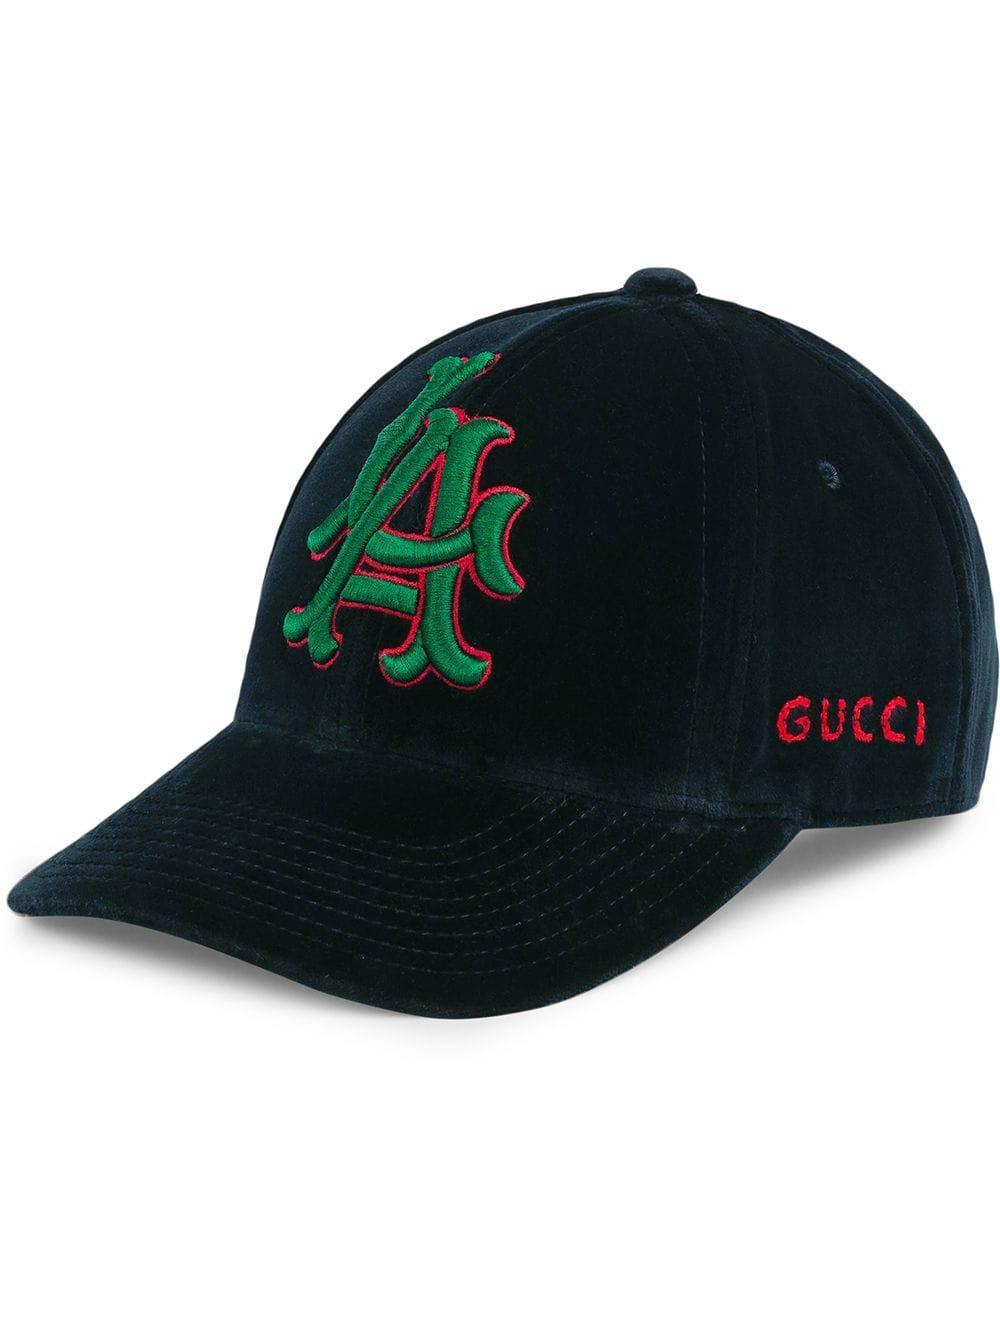 1e57bcc13 Gucci Men's Velvet Baseball Cap With La Angels Mlb Applique In Blue ...